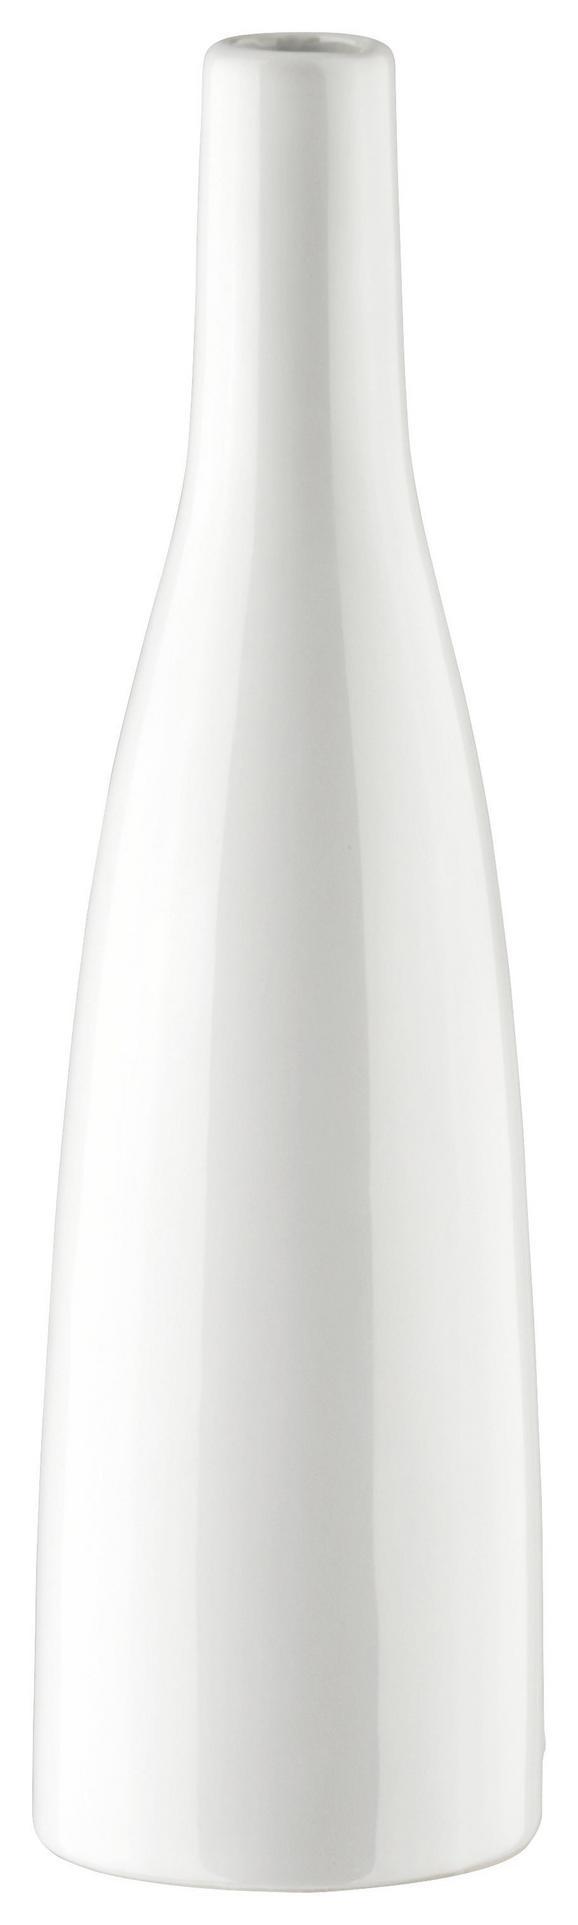 Vaza Plancio - bela, Moderno, keramika (27cm) - Mömax modern living